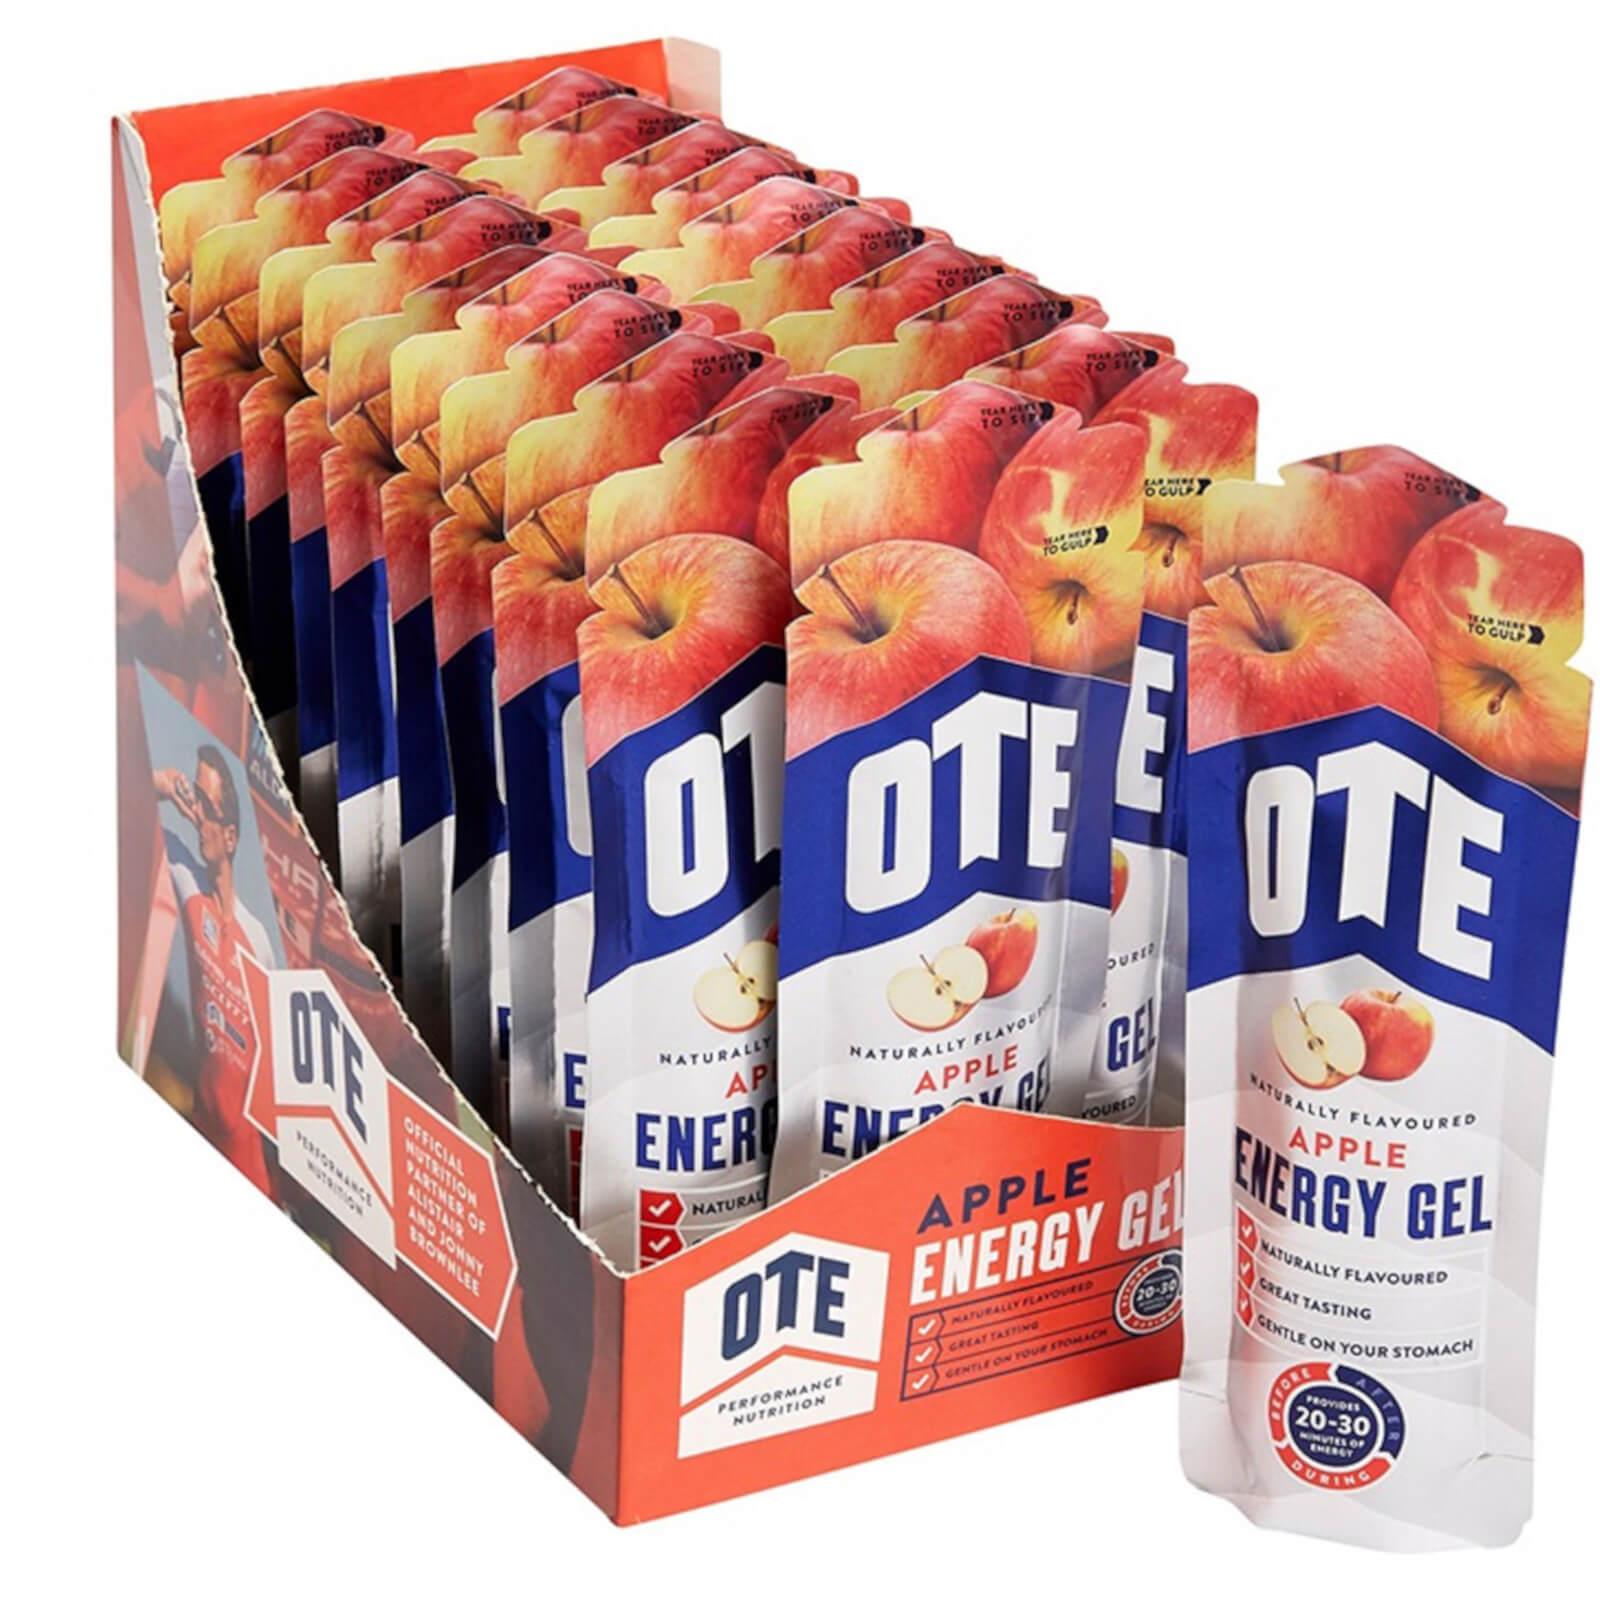 OTE Sports Energy Gel - Box of 20 - Box of 20 - Orange